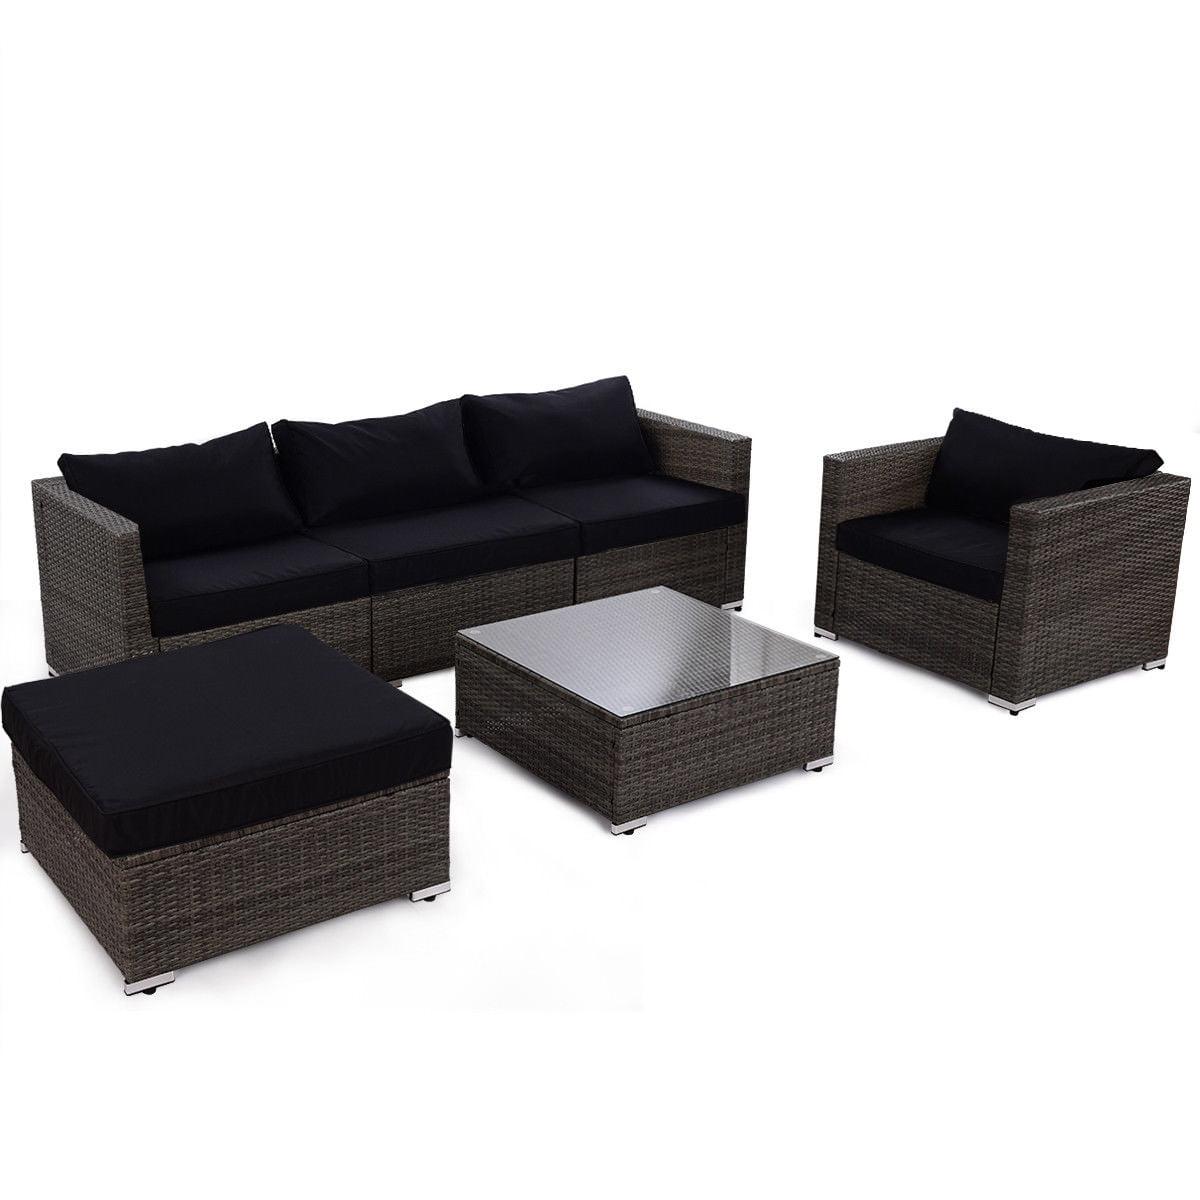 Gymax Outdoors 6pc Patio Set Rattan Wicker Furniture W Black Cushion